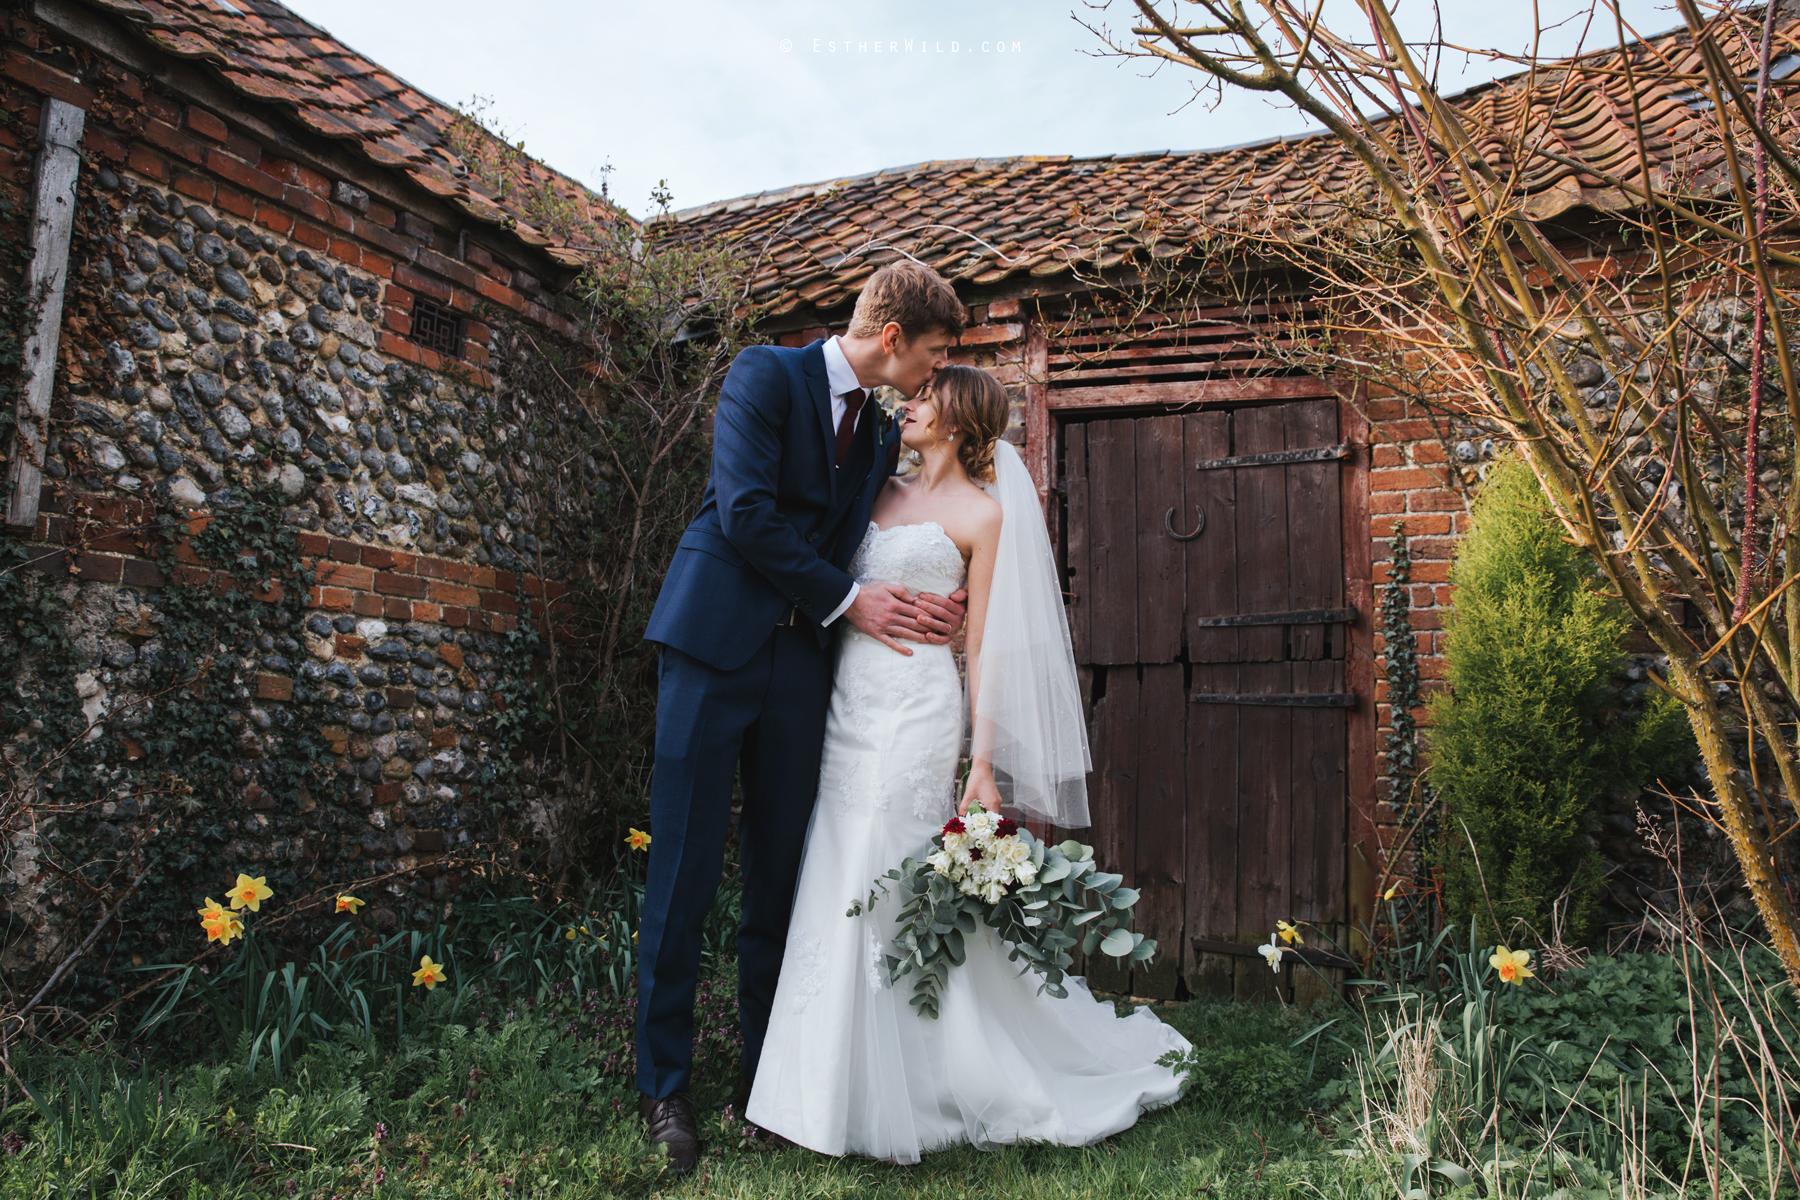 Glebe_Farm_Barn_Rustic_Norfolk_Wedding_Esther_Wild_Photographer_Copyright_IMG_1685.jpg